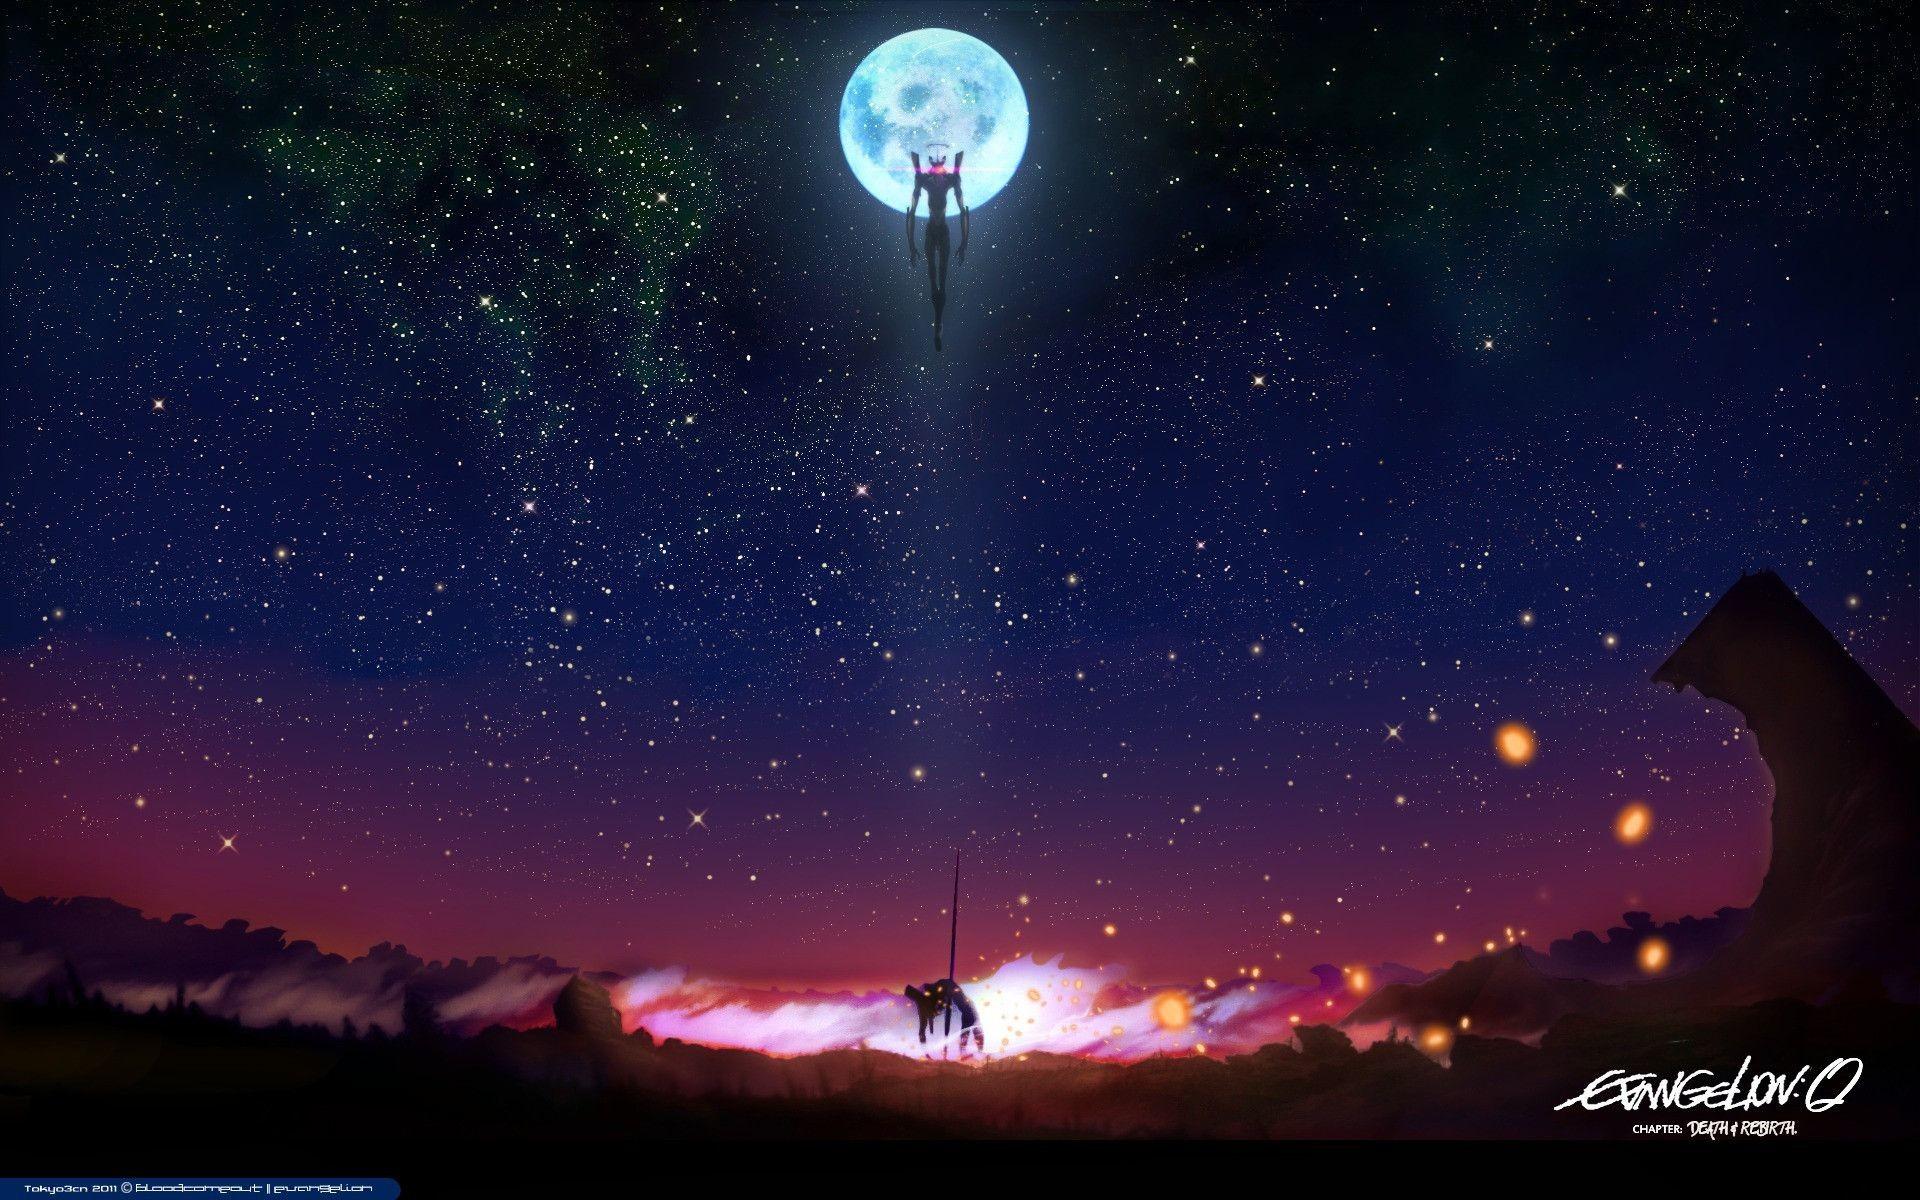 1357766022771 – Евангелионы – Галерея – Форум Evangelion Not End   Neon  Genesis Evangelion   Pinterest   Neon genesis evangelion, Rei ayanami and  Anime